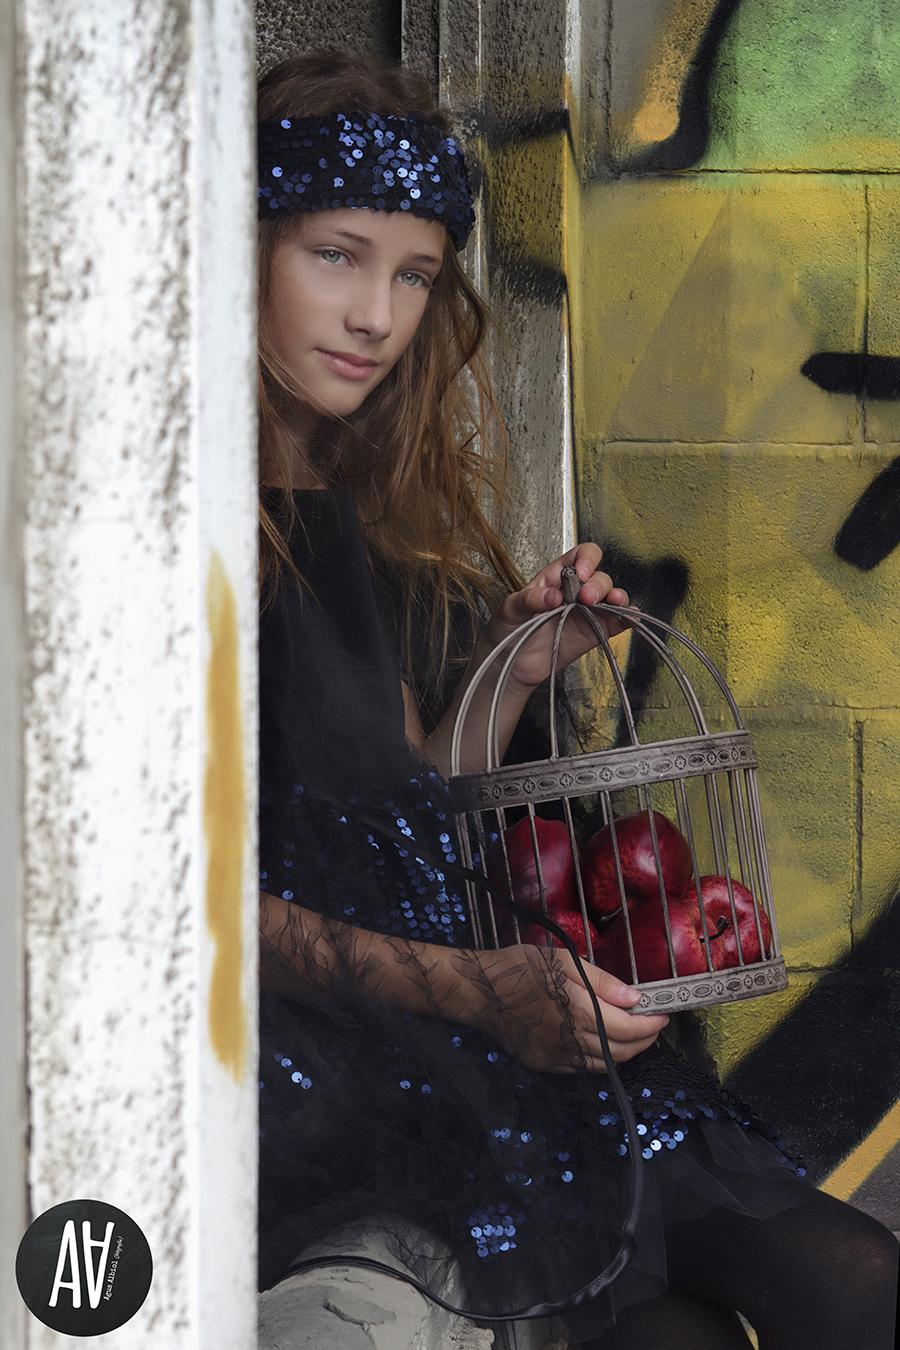 la reina malvada agus Albiol Fotografia barcelona once upon a time sesiones de cuento.5